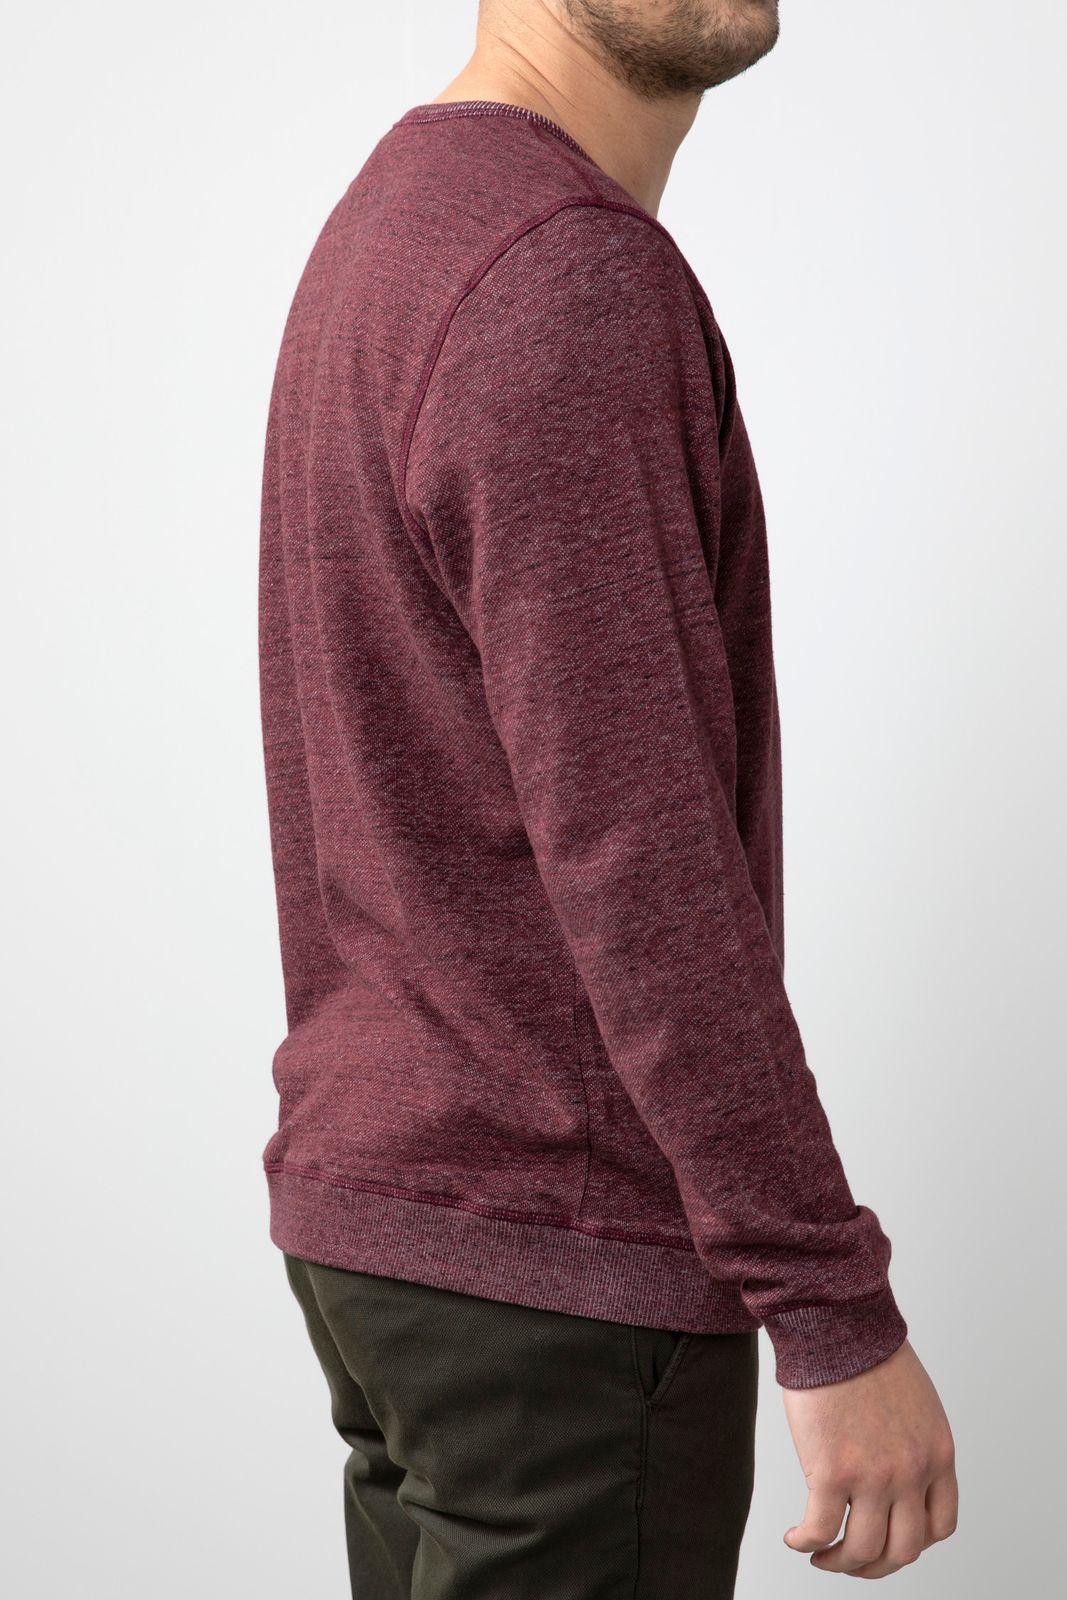 Bruin/paars t-shirt structuur